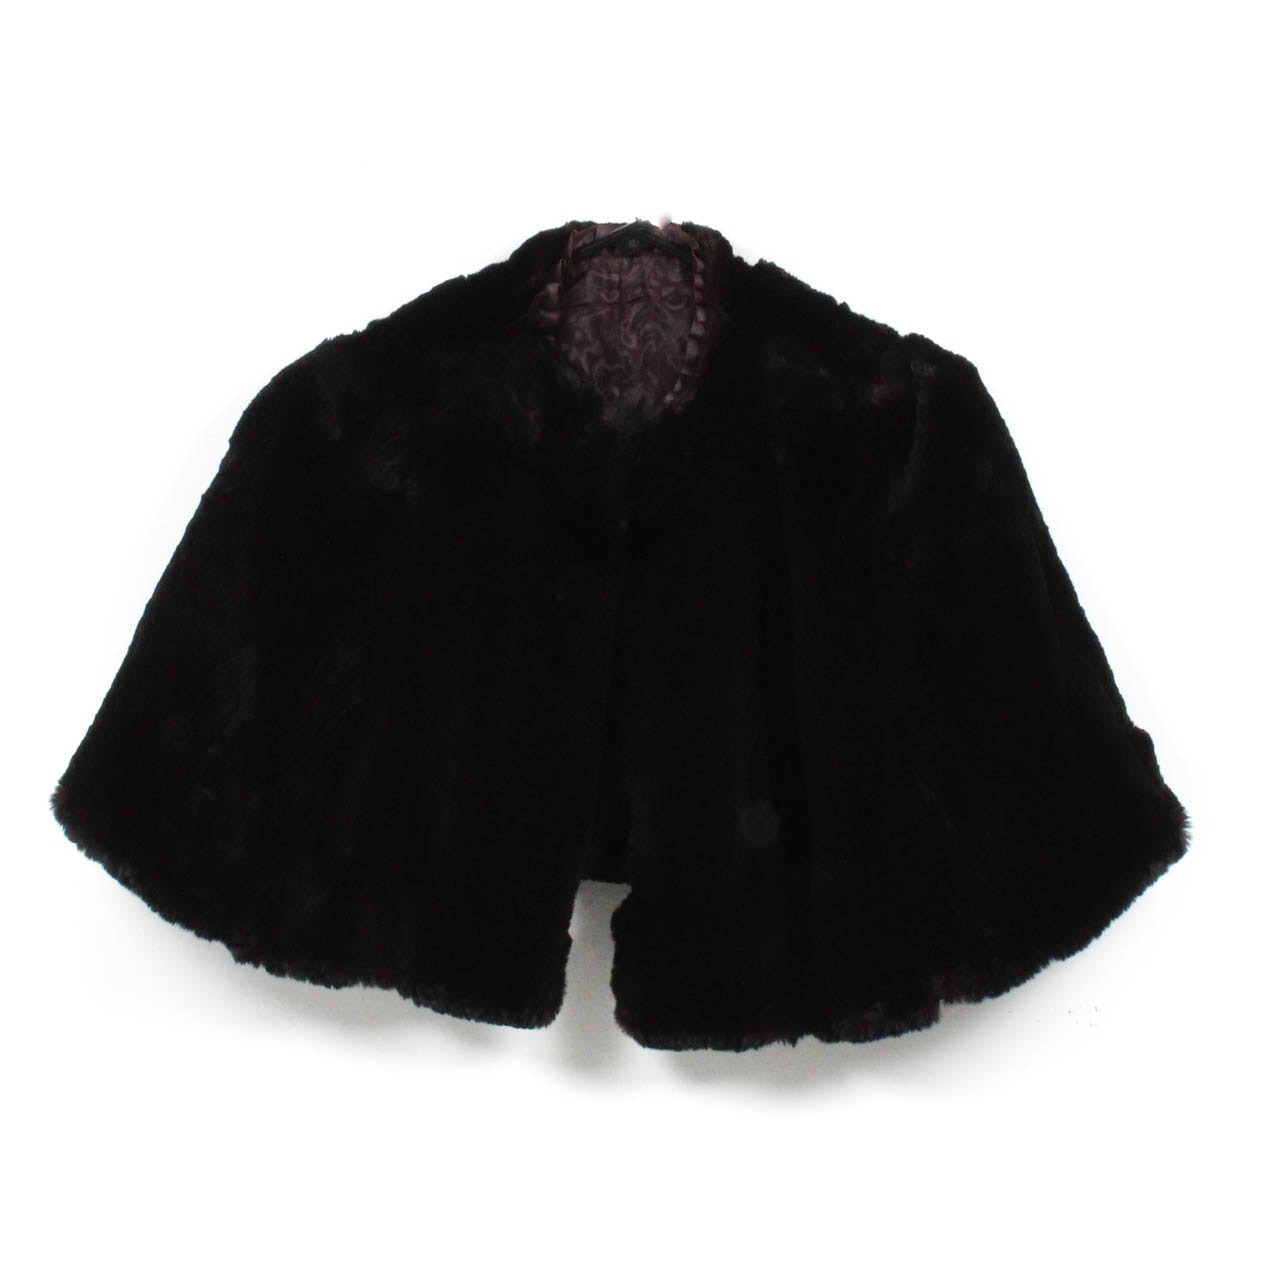 Vintage Dyed Black Sheared Beaver Capelet